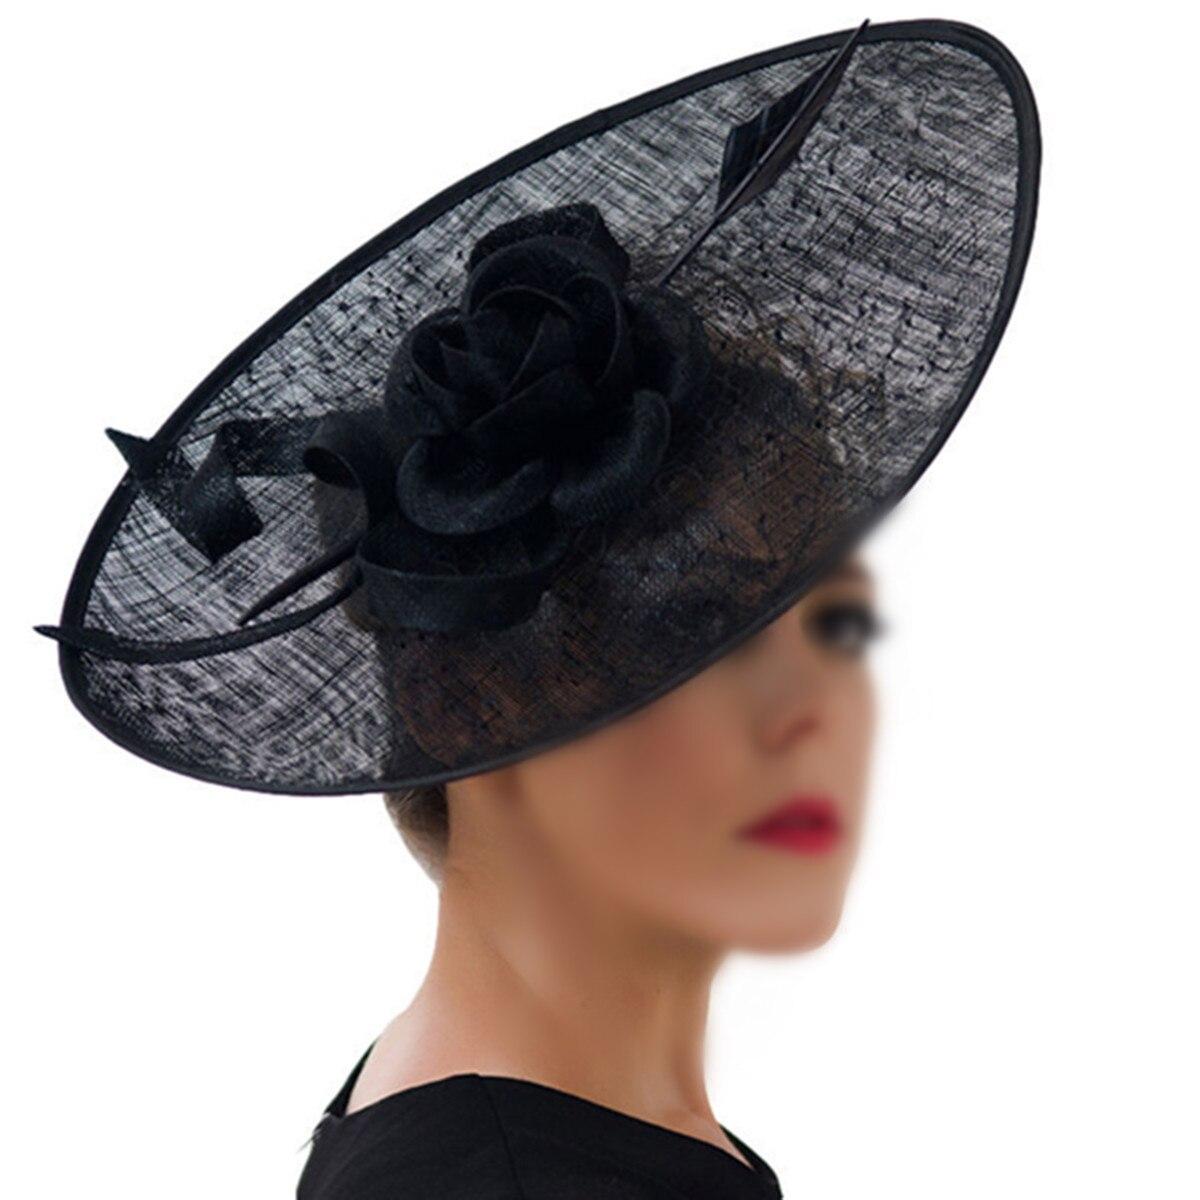 Black White Women Elegant Feather Fascinator Large Sinamay Flower Headband Mesh Party Headdress Top Hat Wedding Hair Accessories